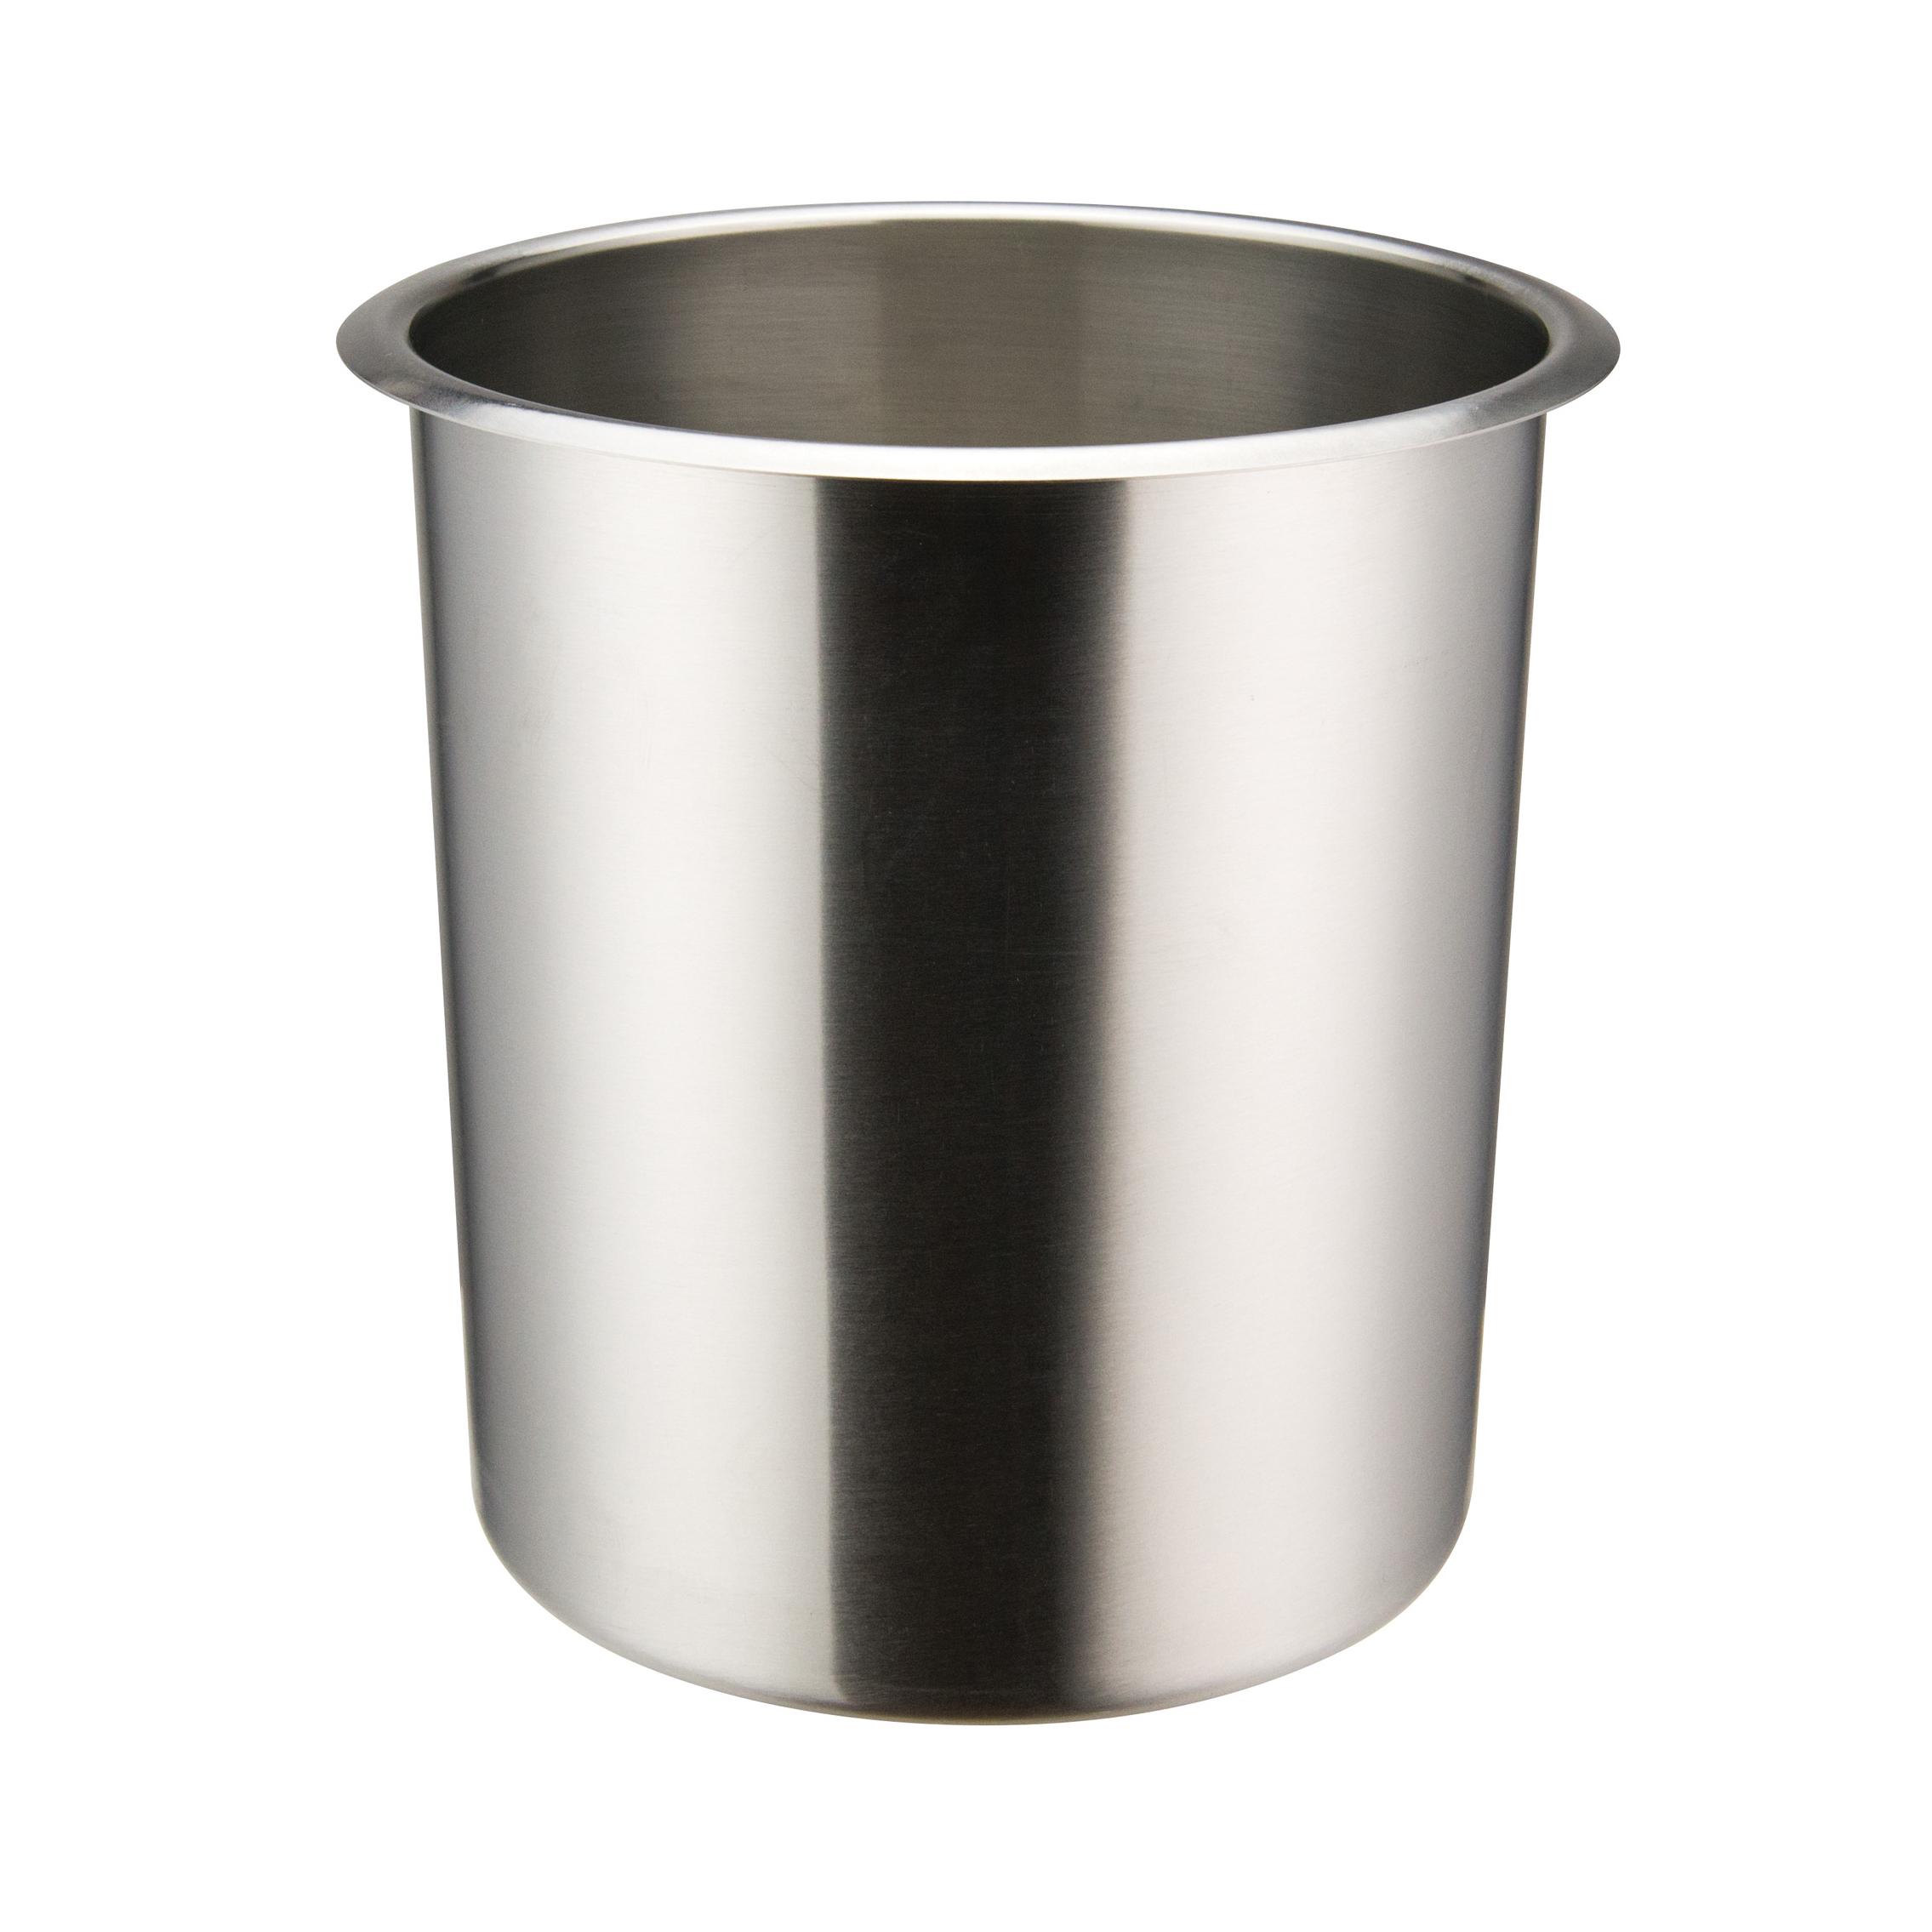 Winco BAM-3.5 bain marie pot